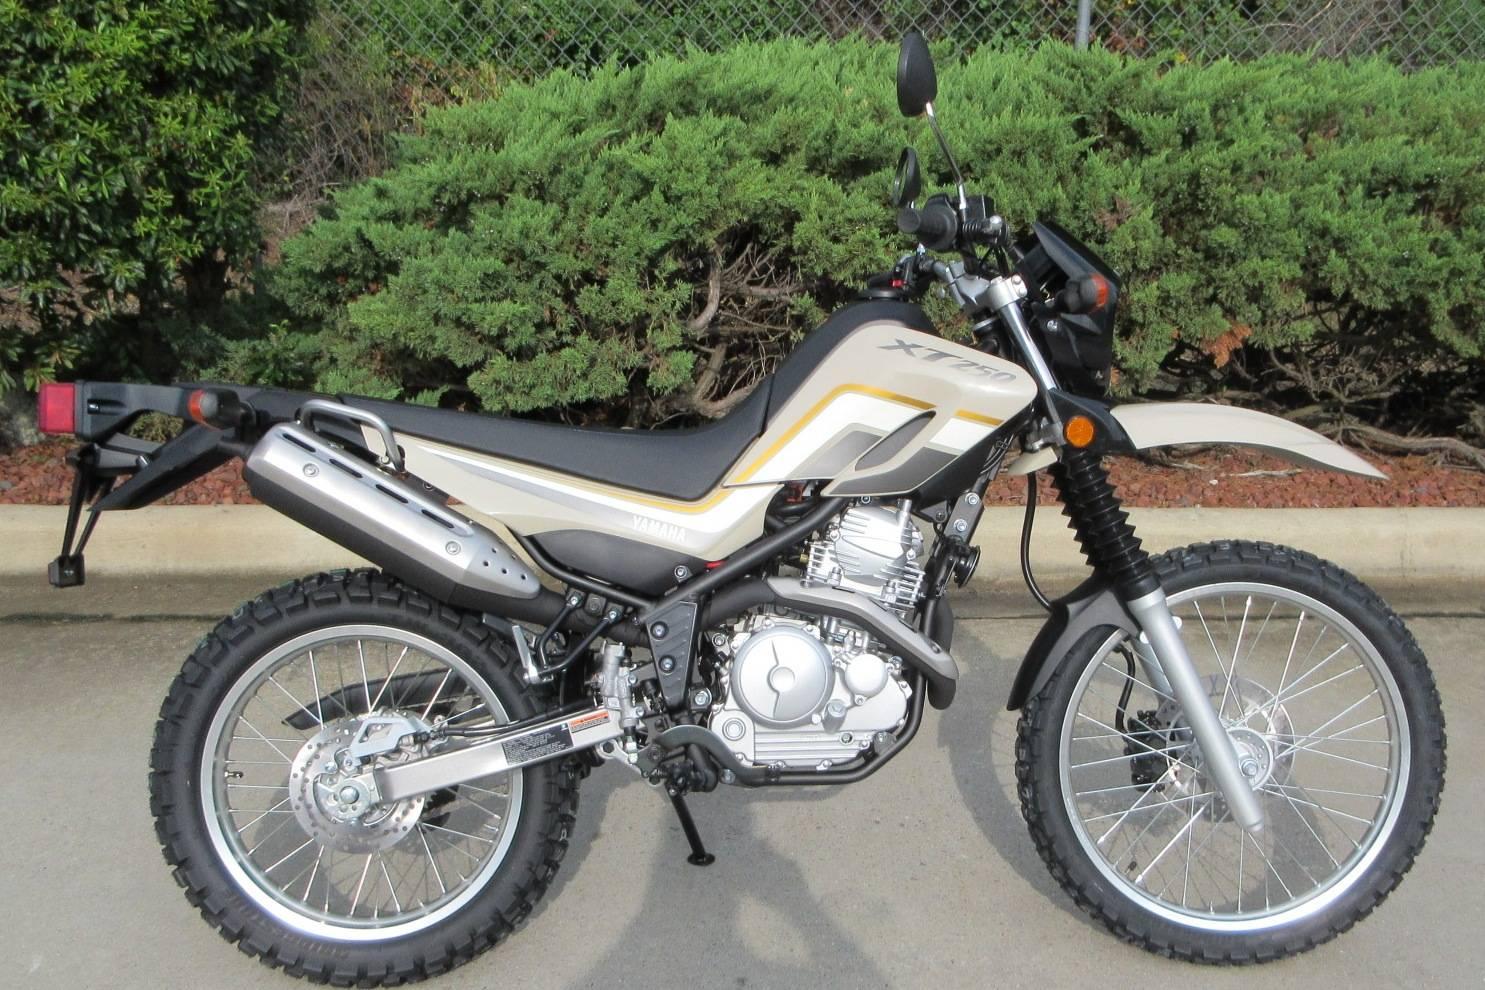 2019 Yamaha XT250 For Sale Sumter, SC : 52845